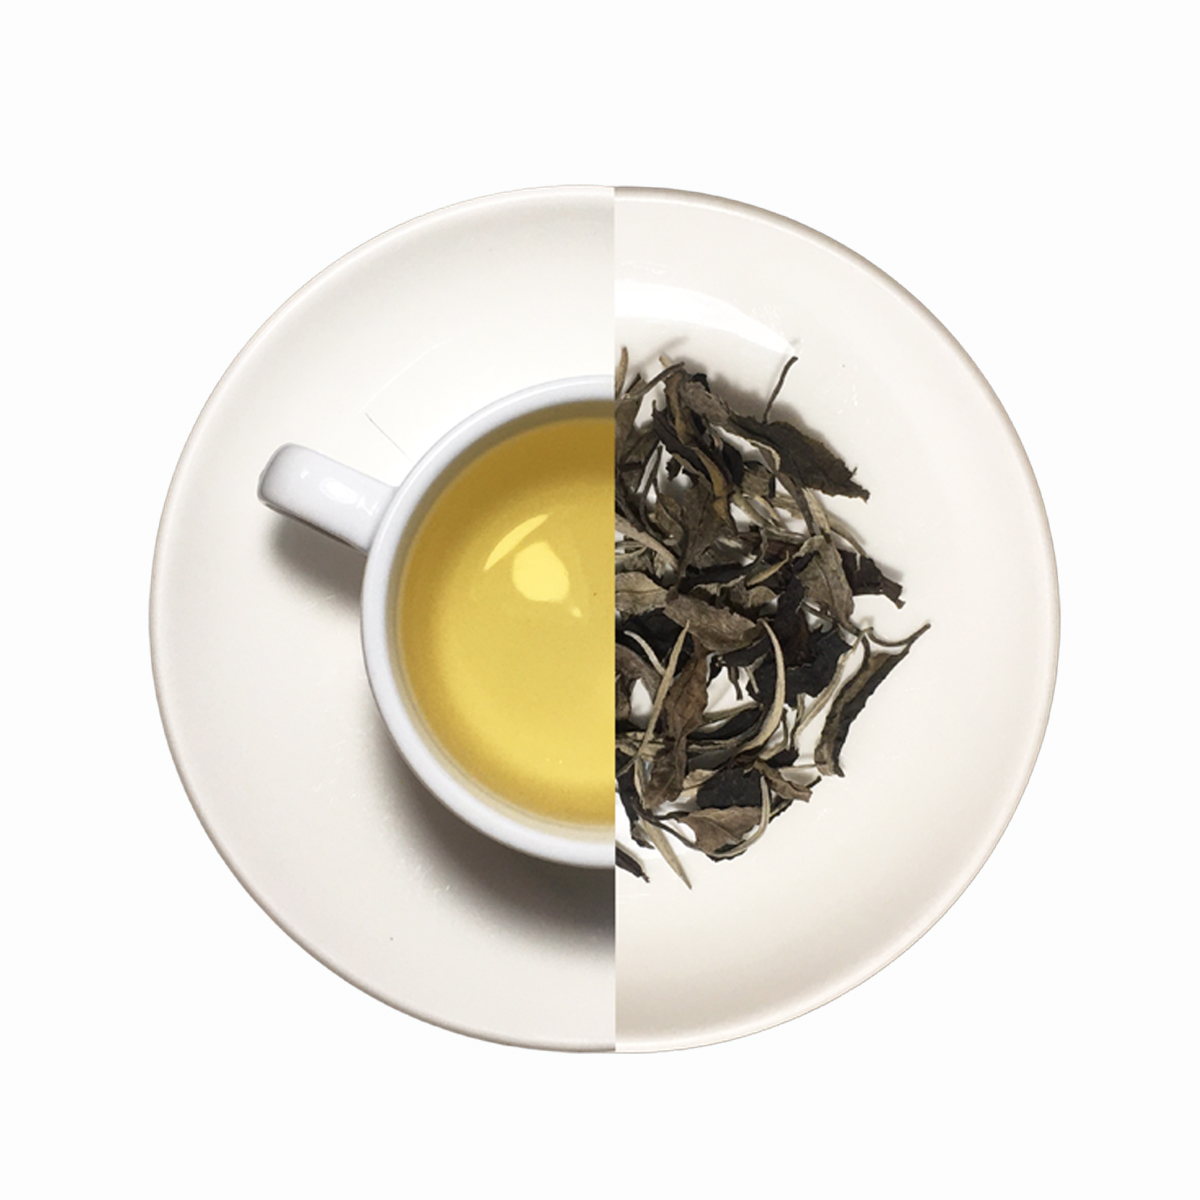 Shan Tuyết Bạch Trà Mây Cao Cấp 75g - White Tea